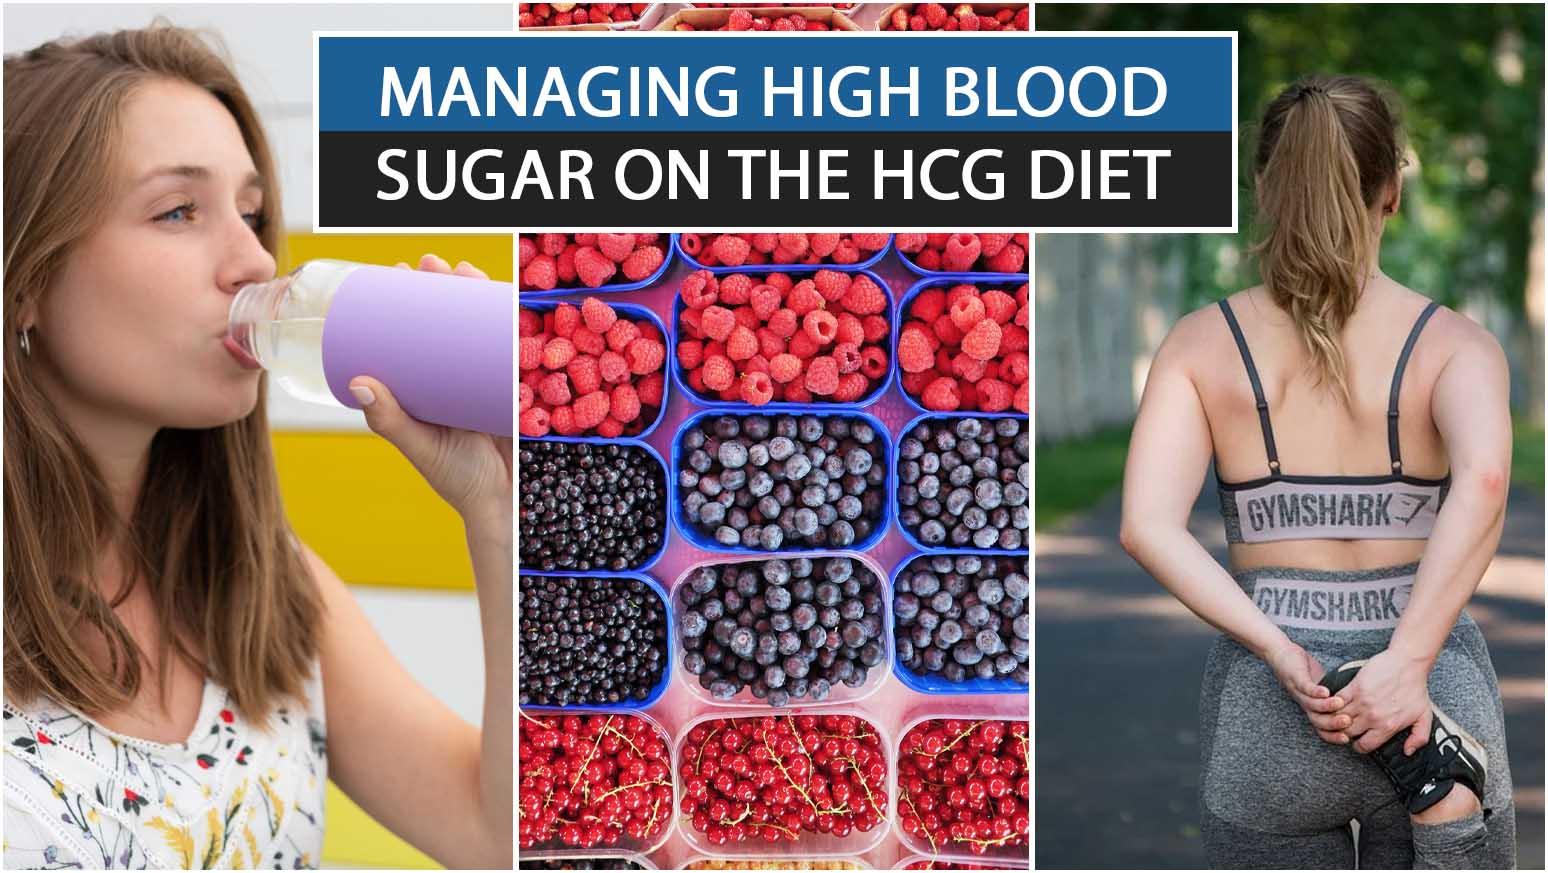 MANAGING HIGH BLOOD SUGAR ON THE HCG DIET